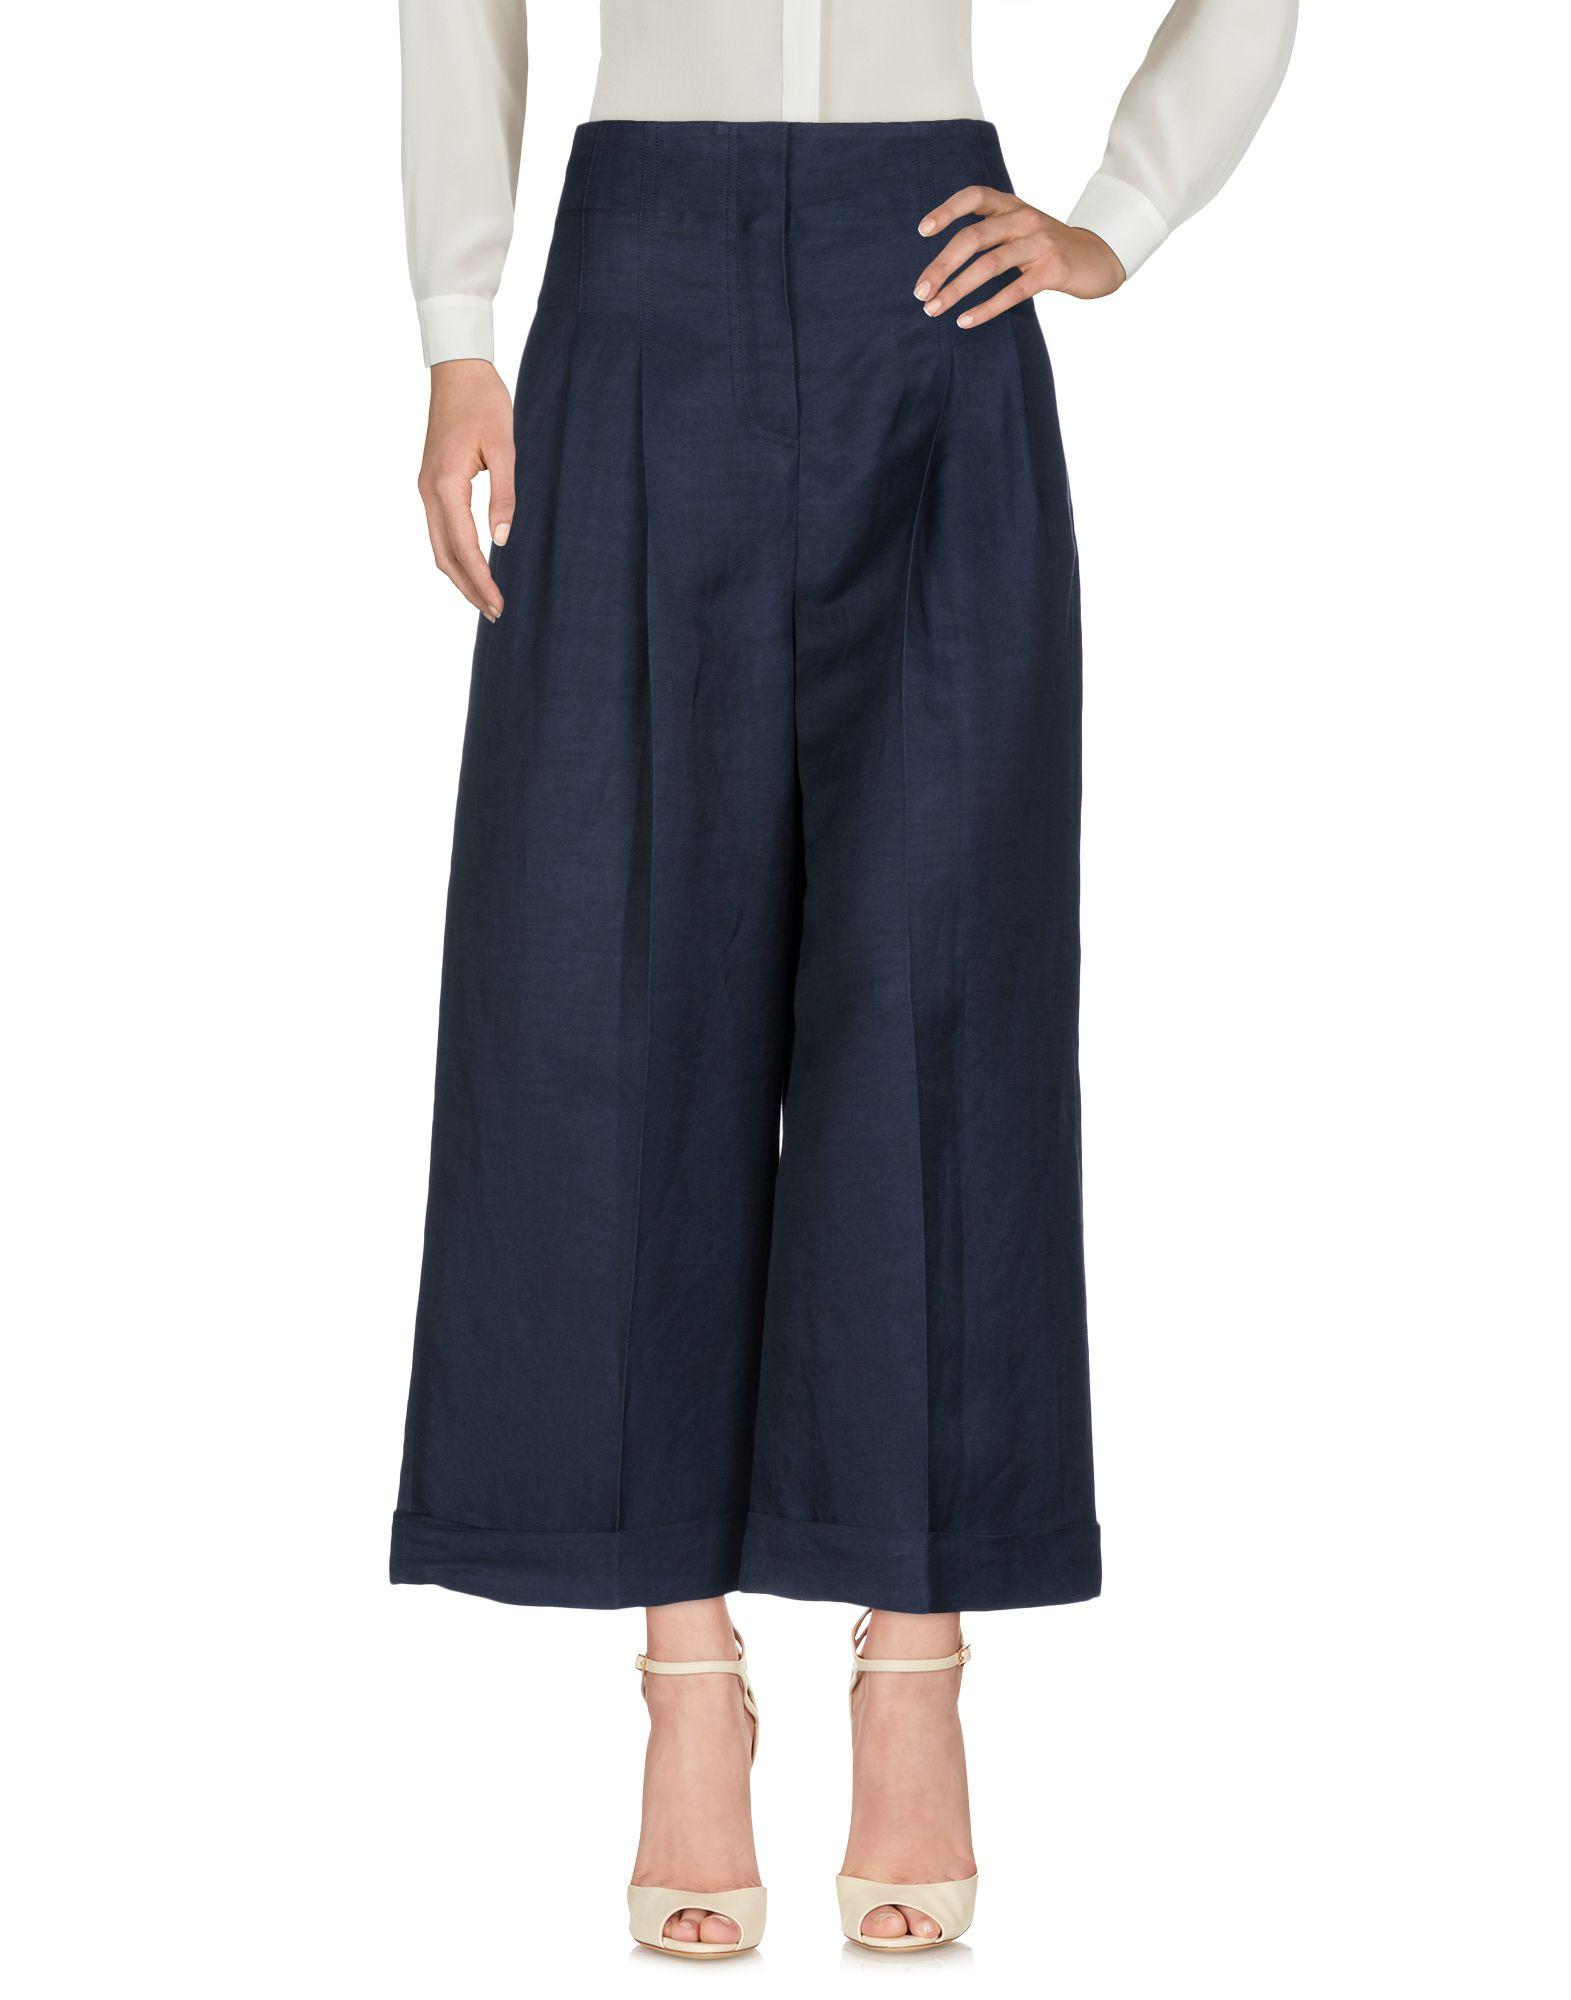 Pantalone Céline Donna - Acquista online su 1WwgJj